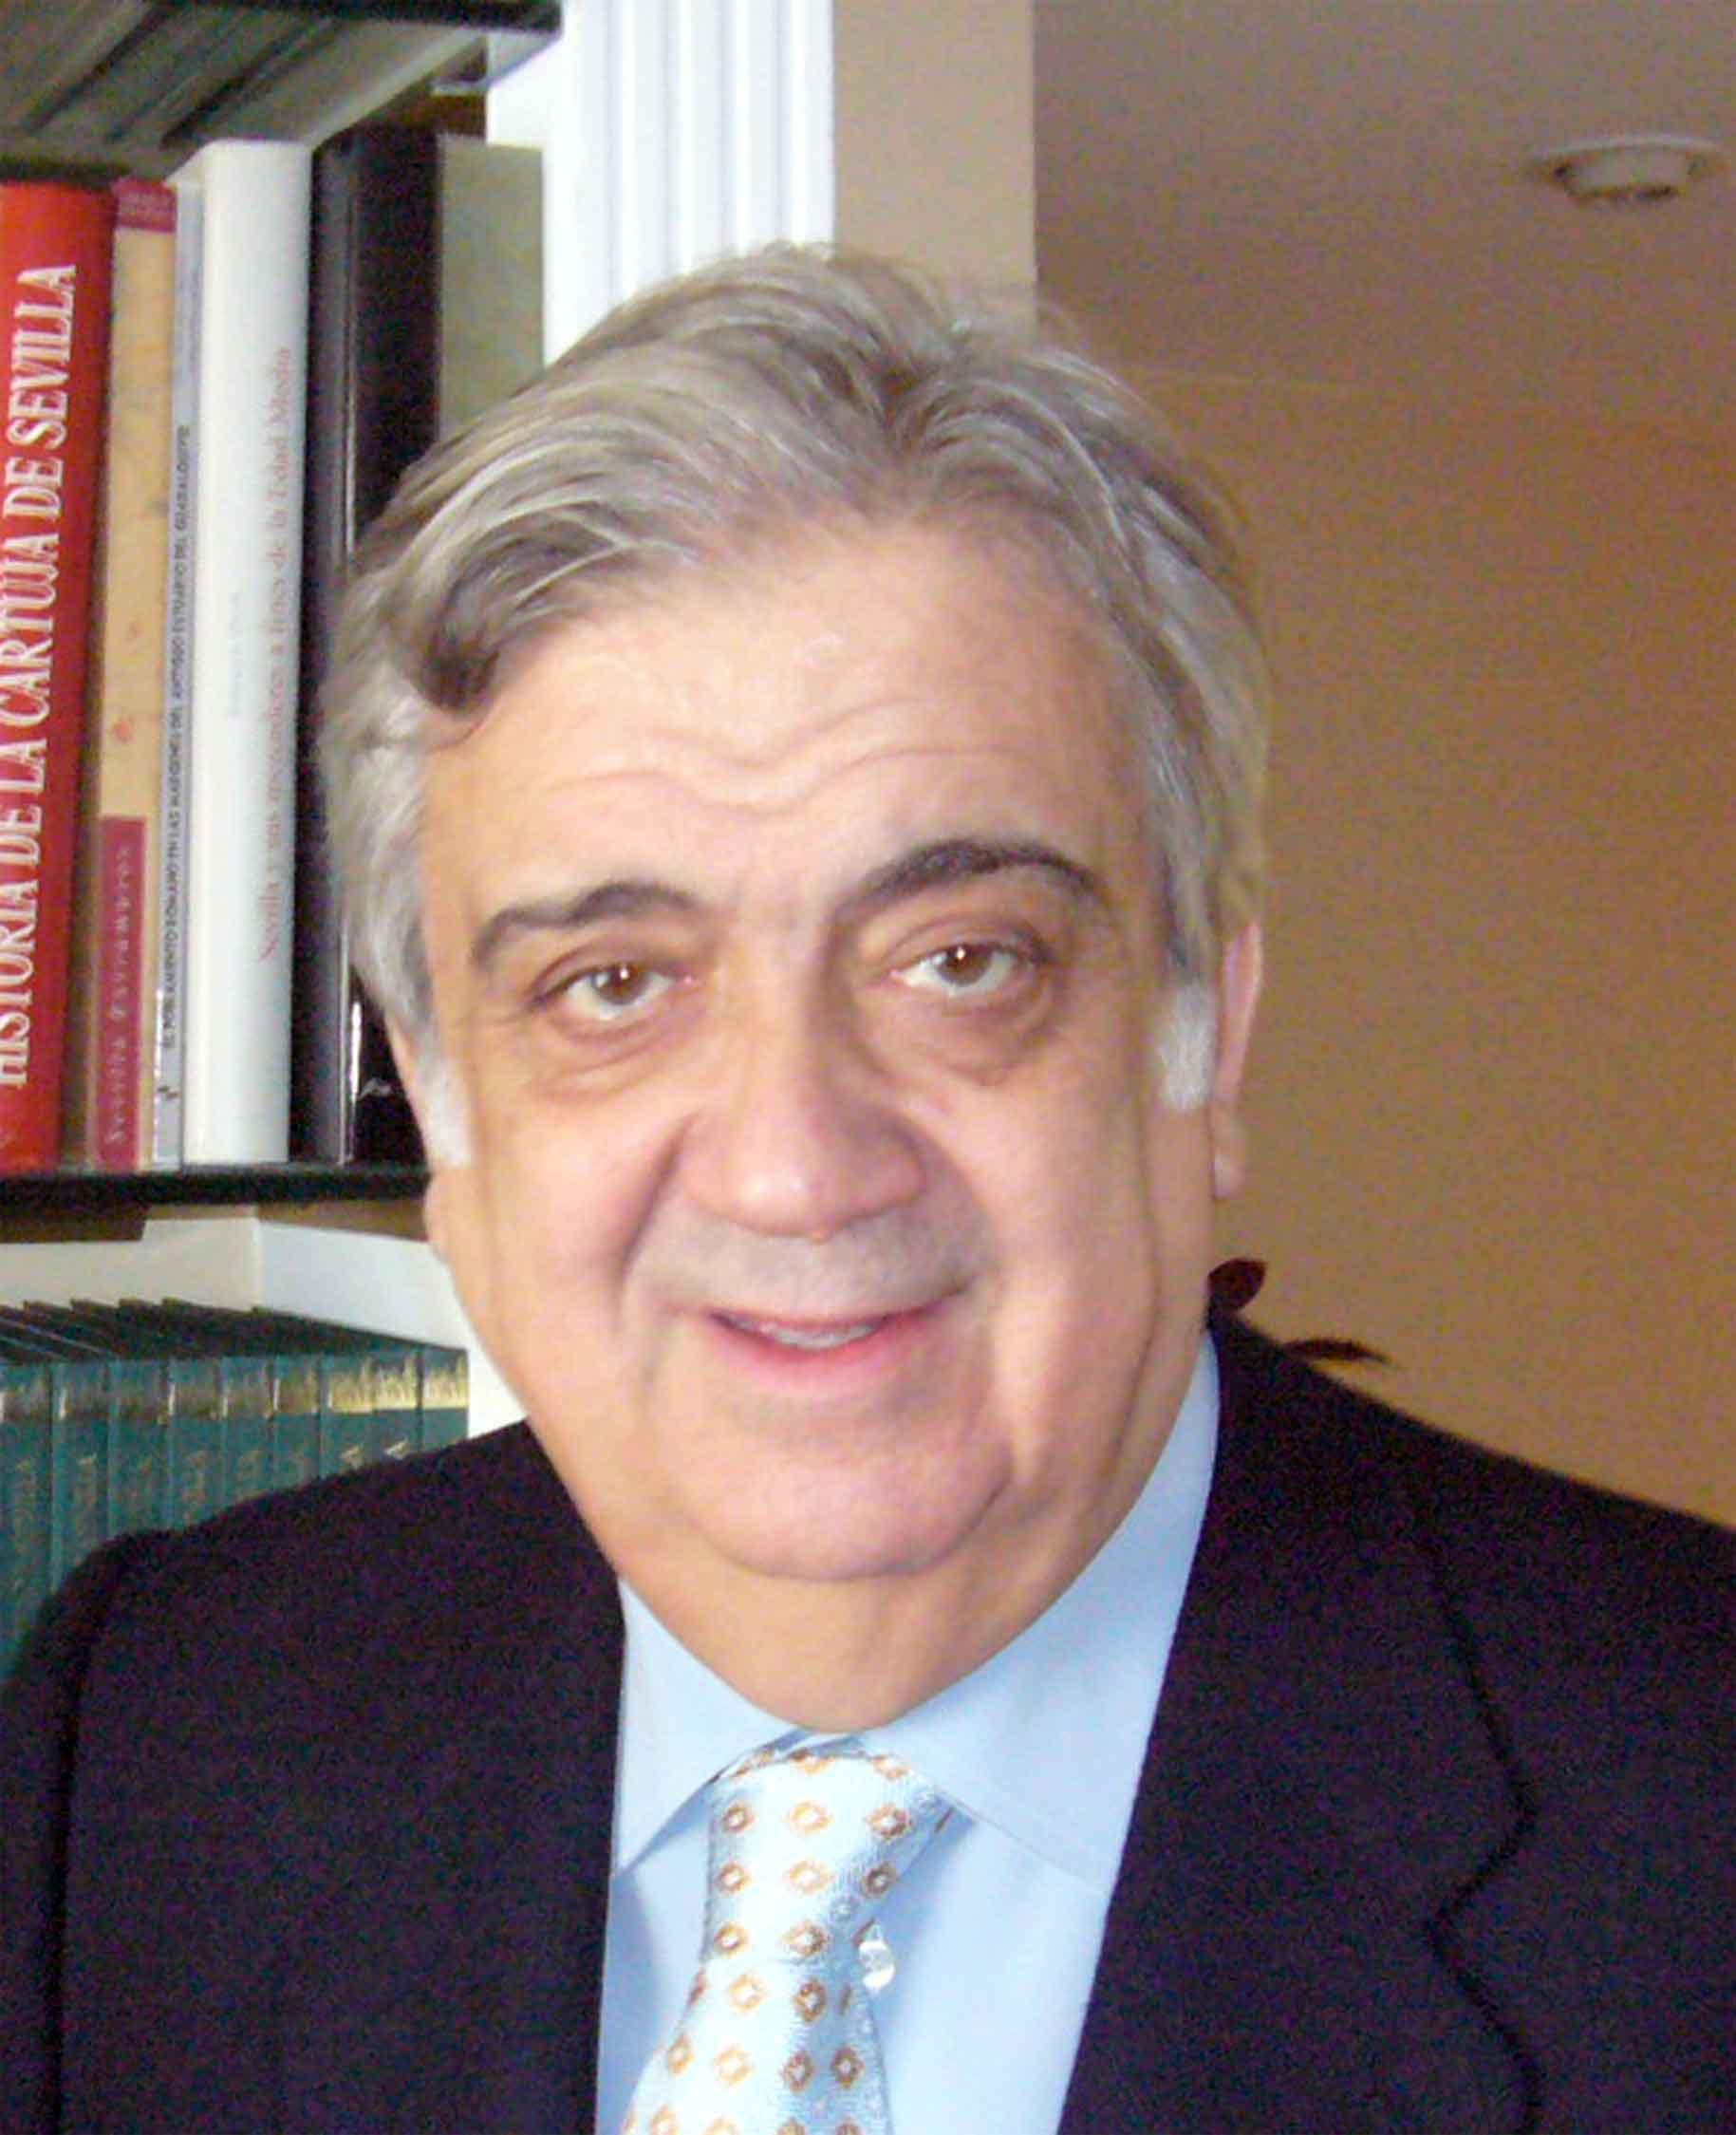 JUAN MIGUEL SALAS TORNERO